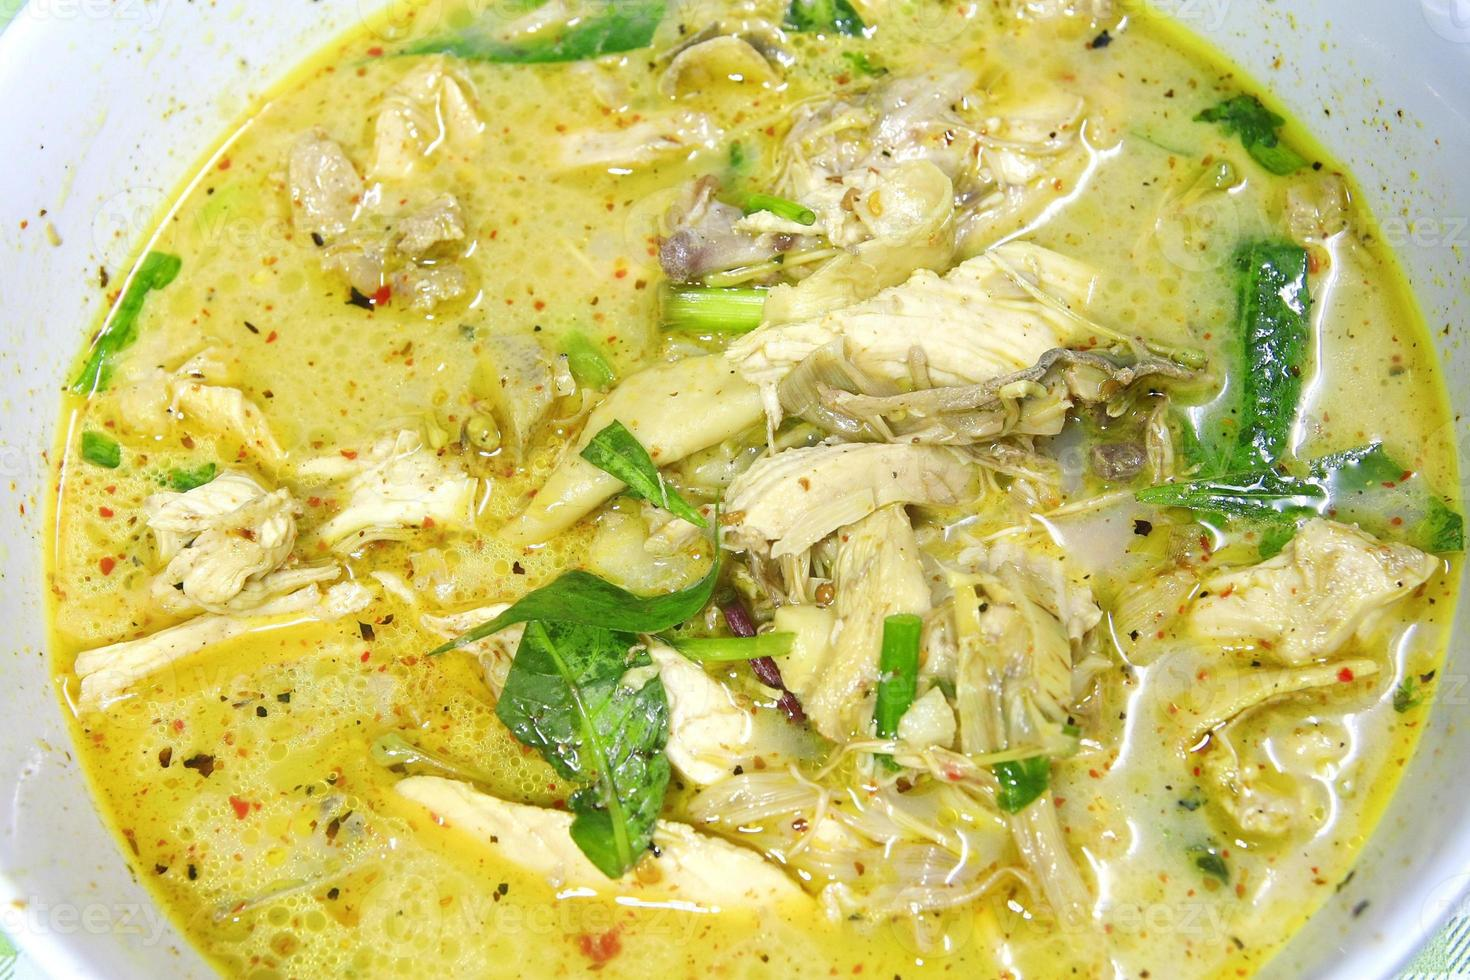 Hühnchen würziges Curry foto